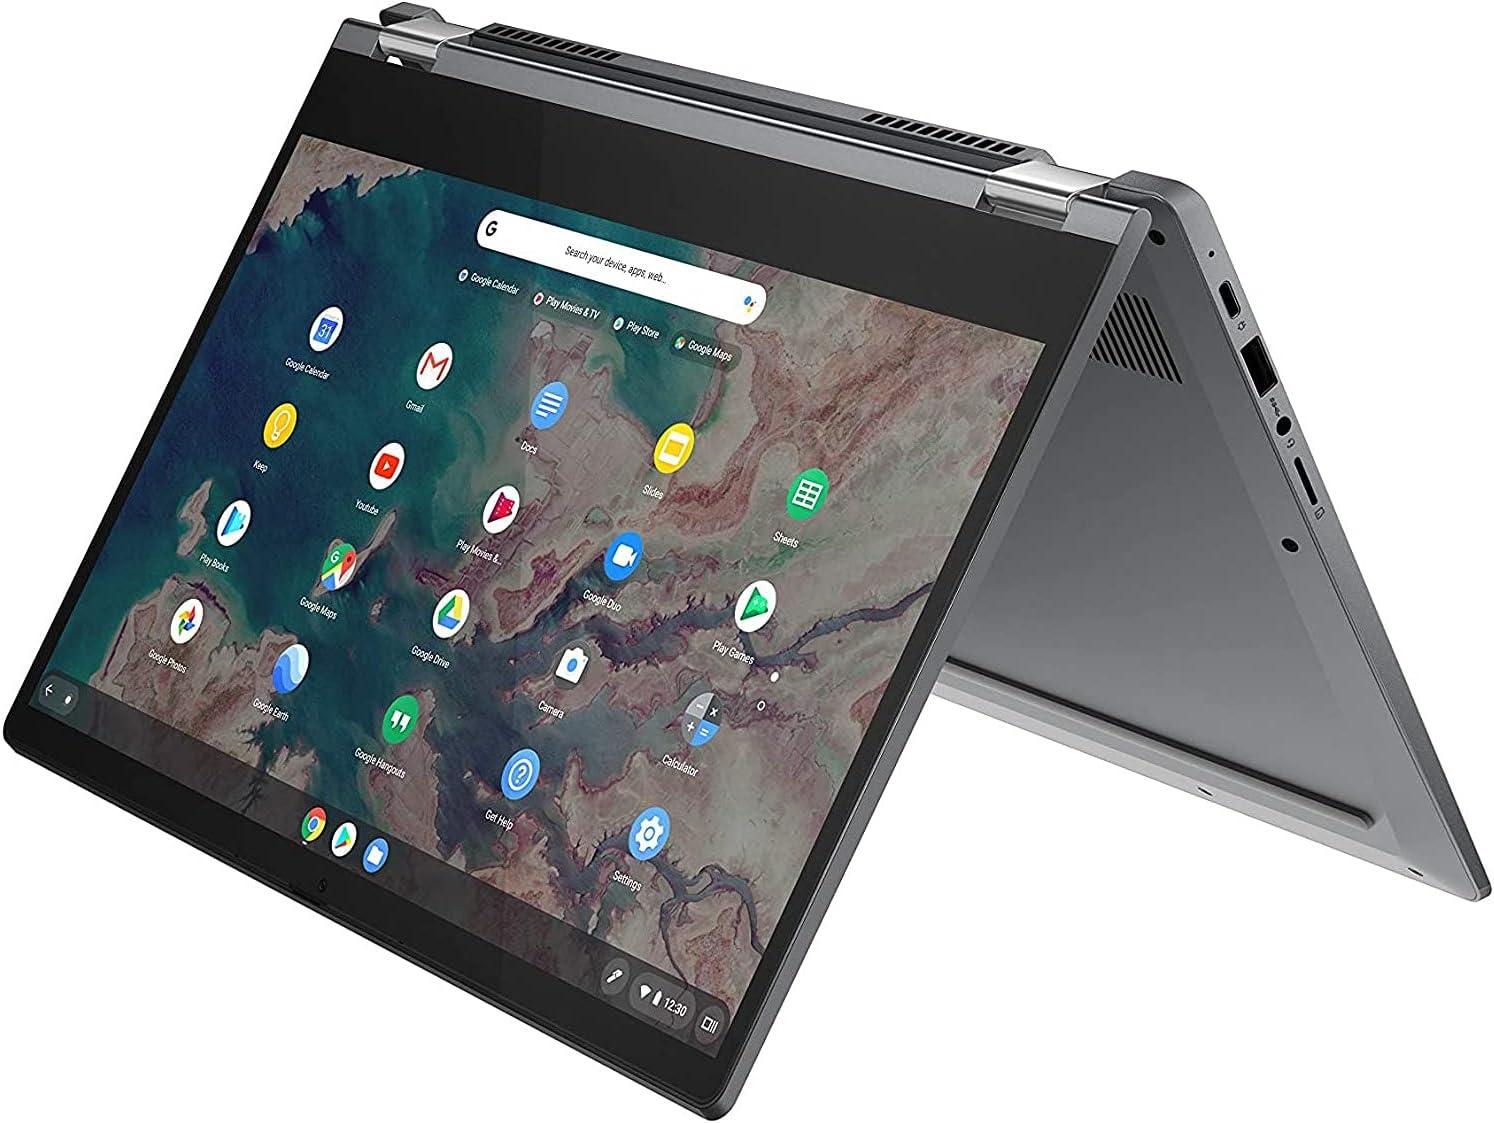 Lenovo Chromebook Flex 5 Convertible 2-in-1 Laptop 13.3 FHD Touch Display Intel Core i3-10110U (Beats i5-7200U) Processor 8GB DDR4 RAM 128GB SSD Intel Integrated Graphics Chrome OS (Renewed)